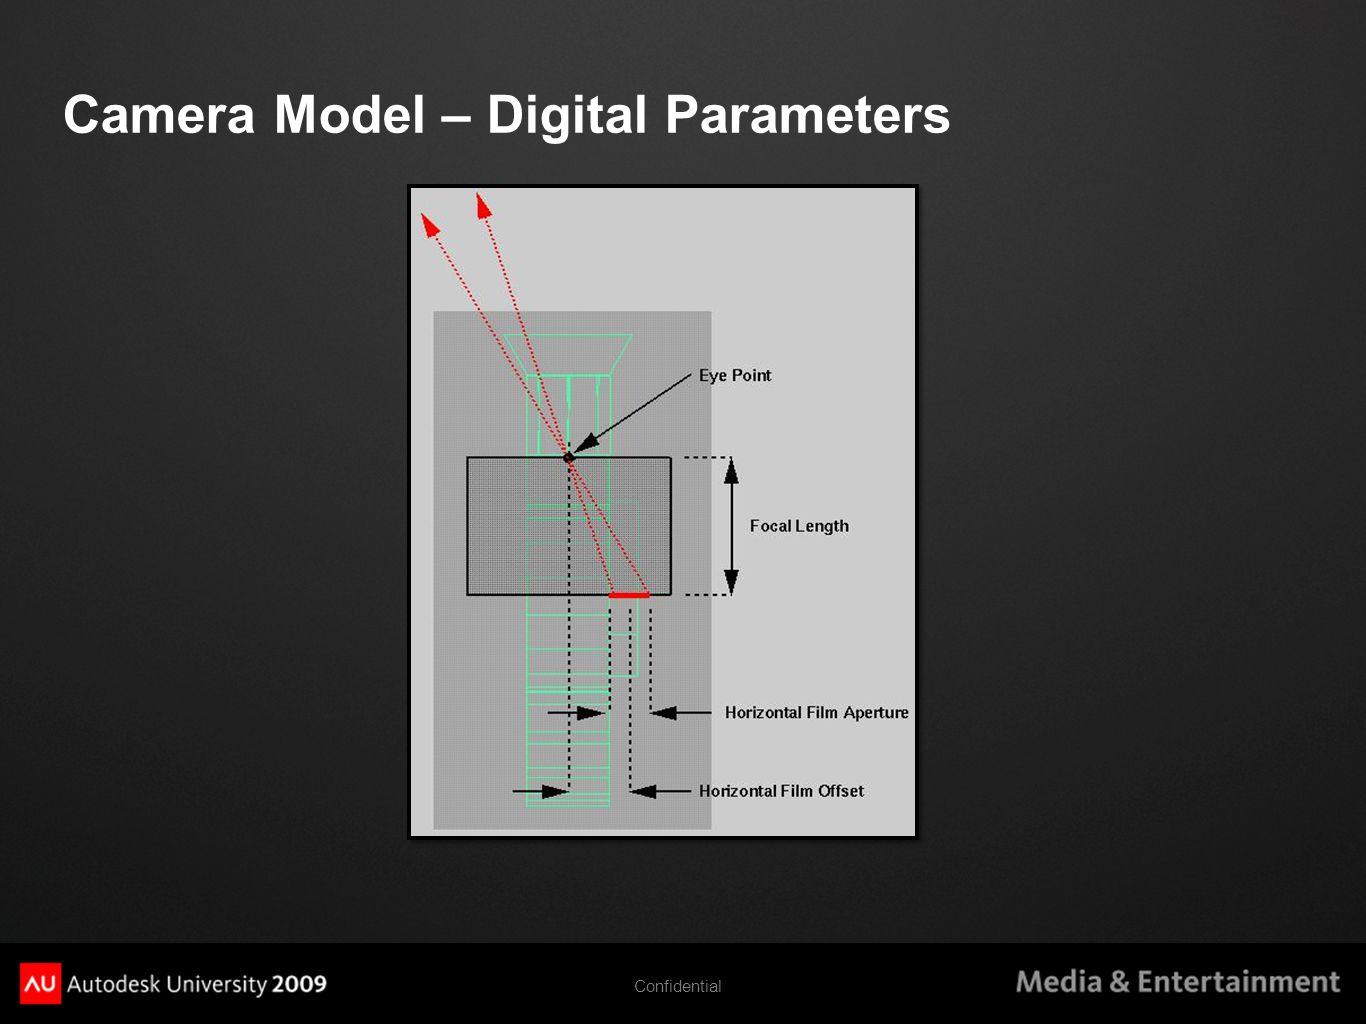 Camera Model – Digital Parameters Confidential